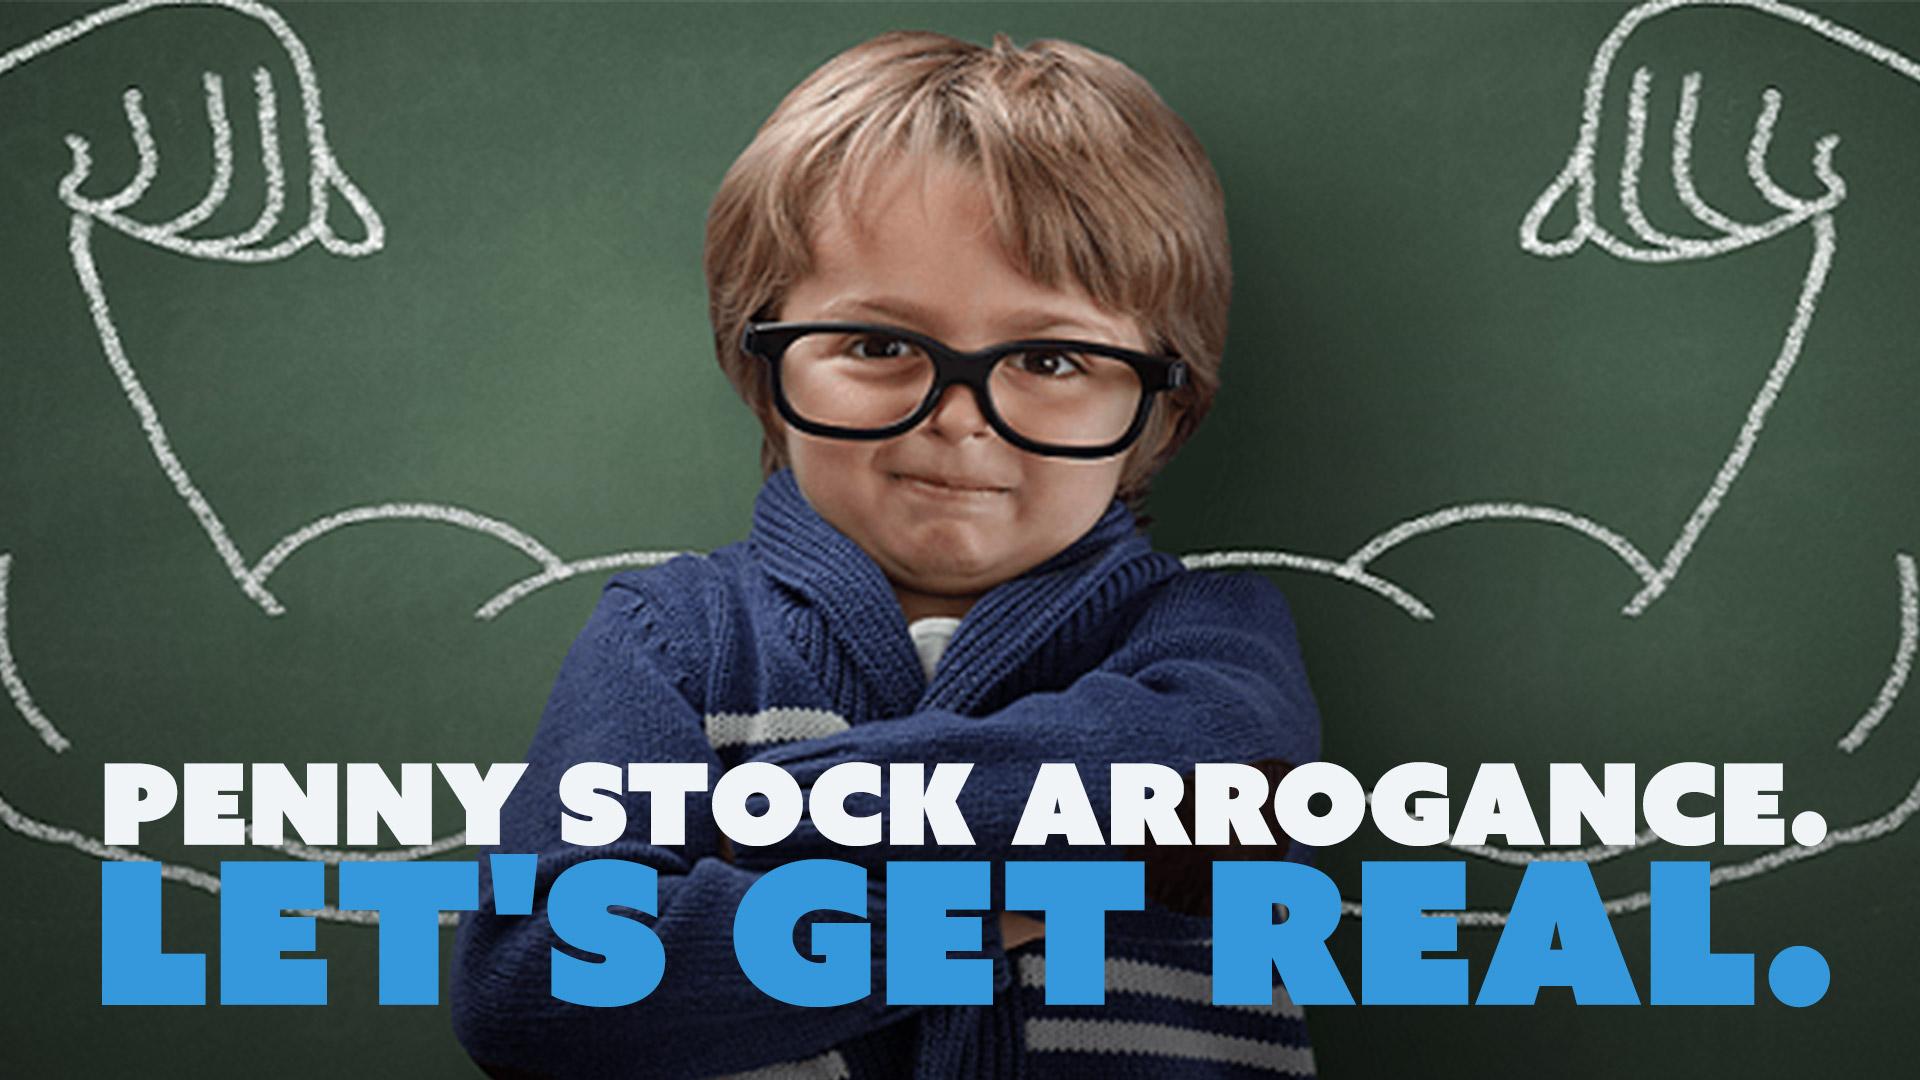 Penny Stock Arrogance. Let's Get Real.